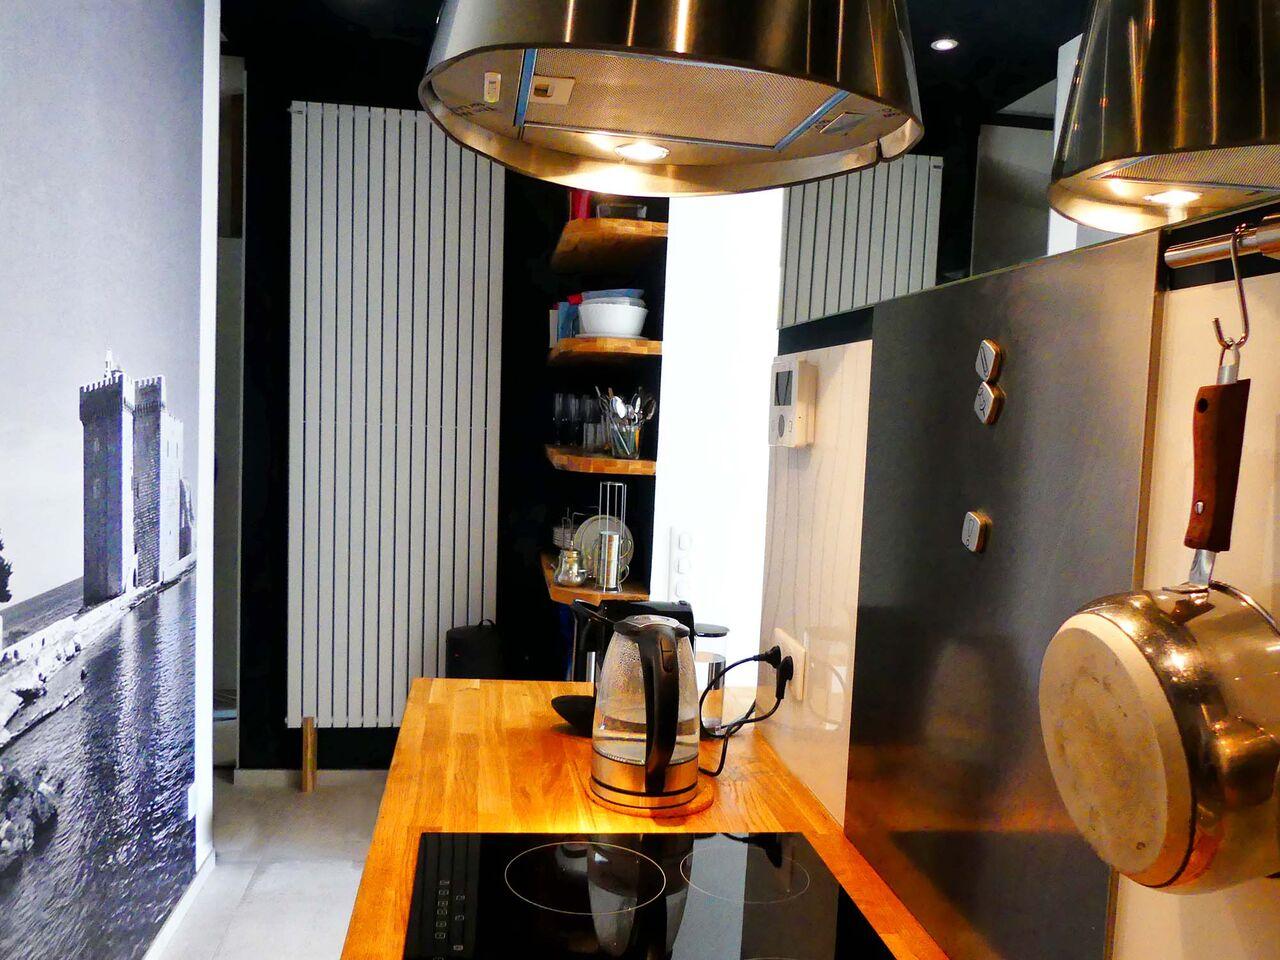 Cuisine urban design appartement Cannes - Villa Marceau